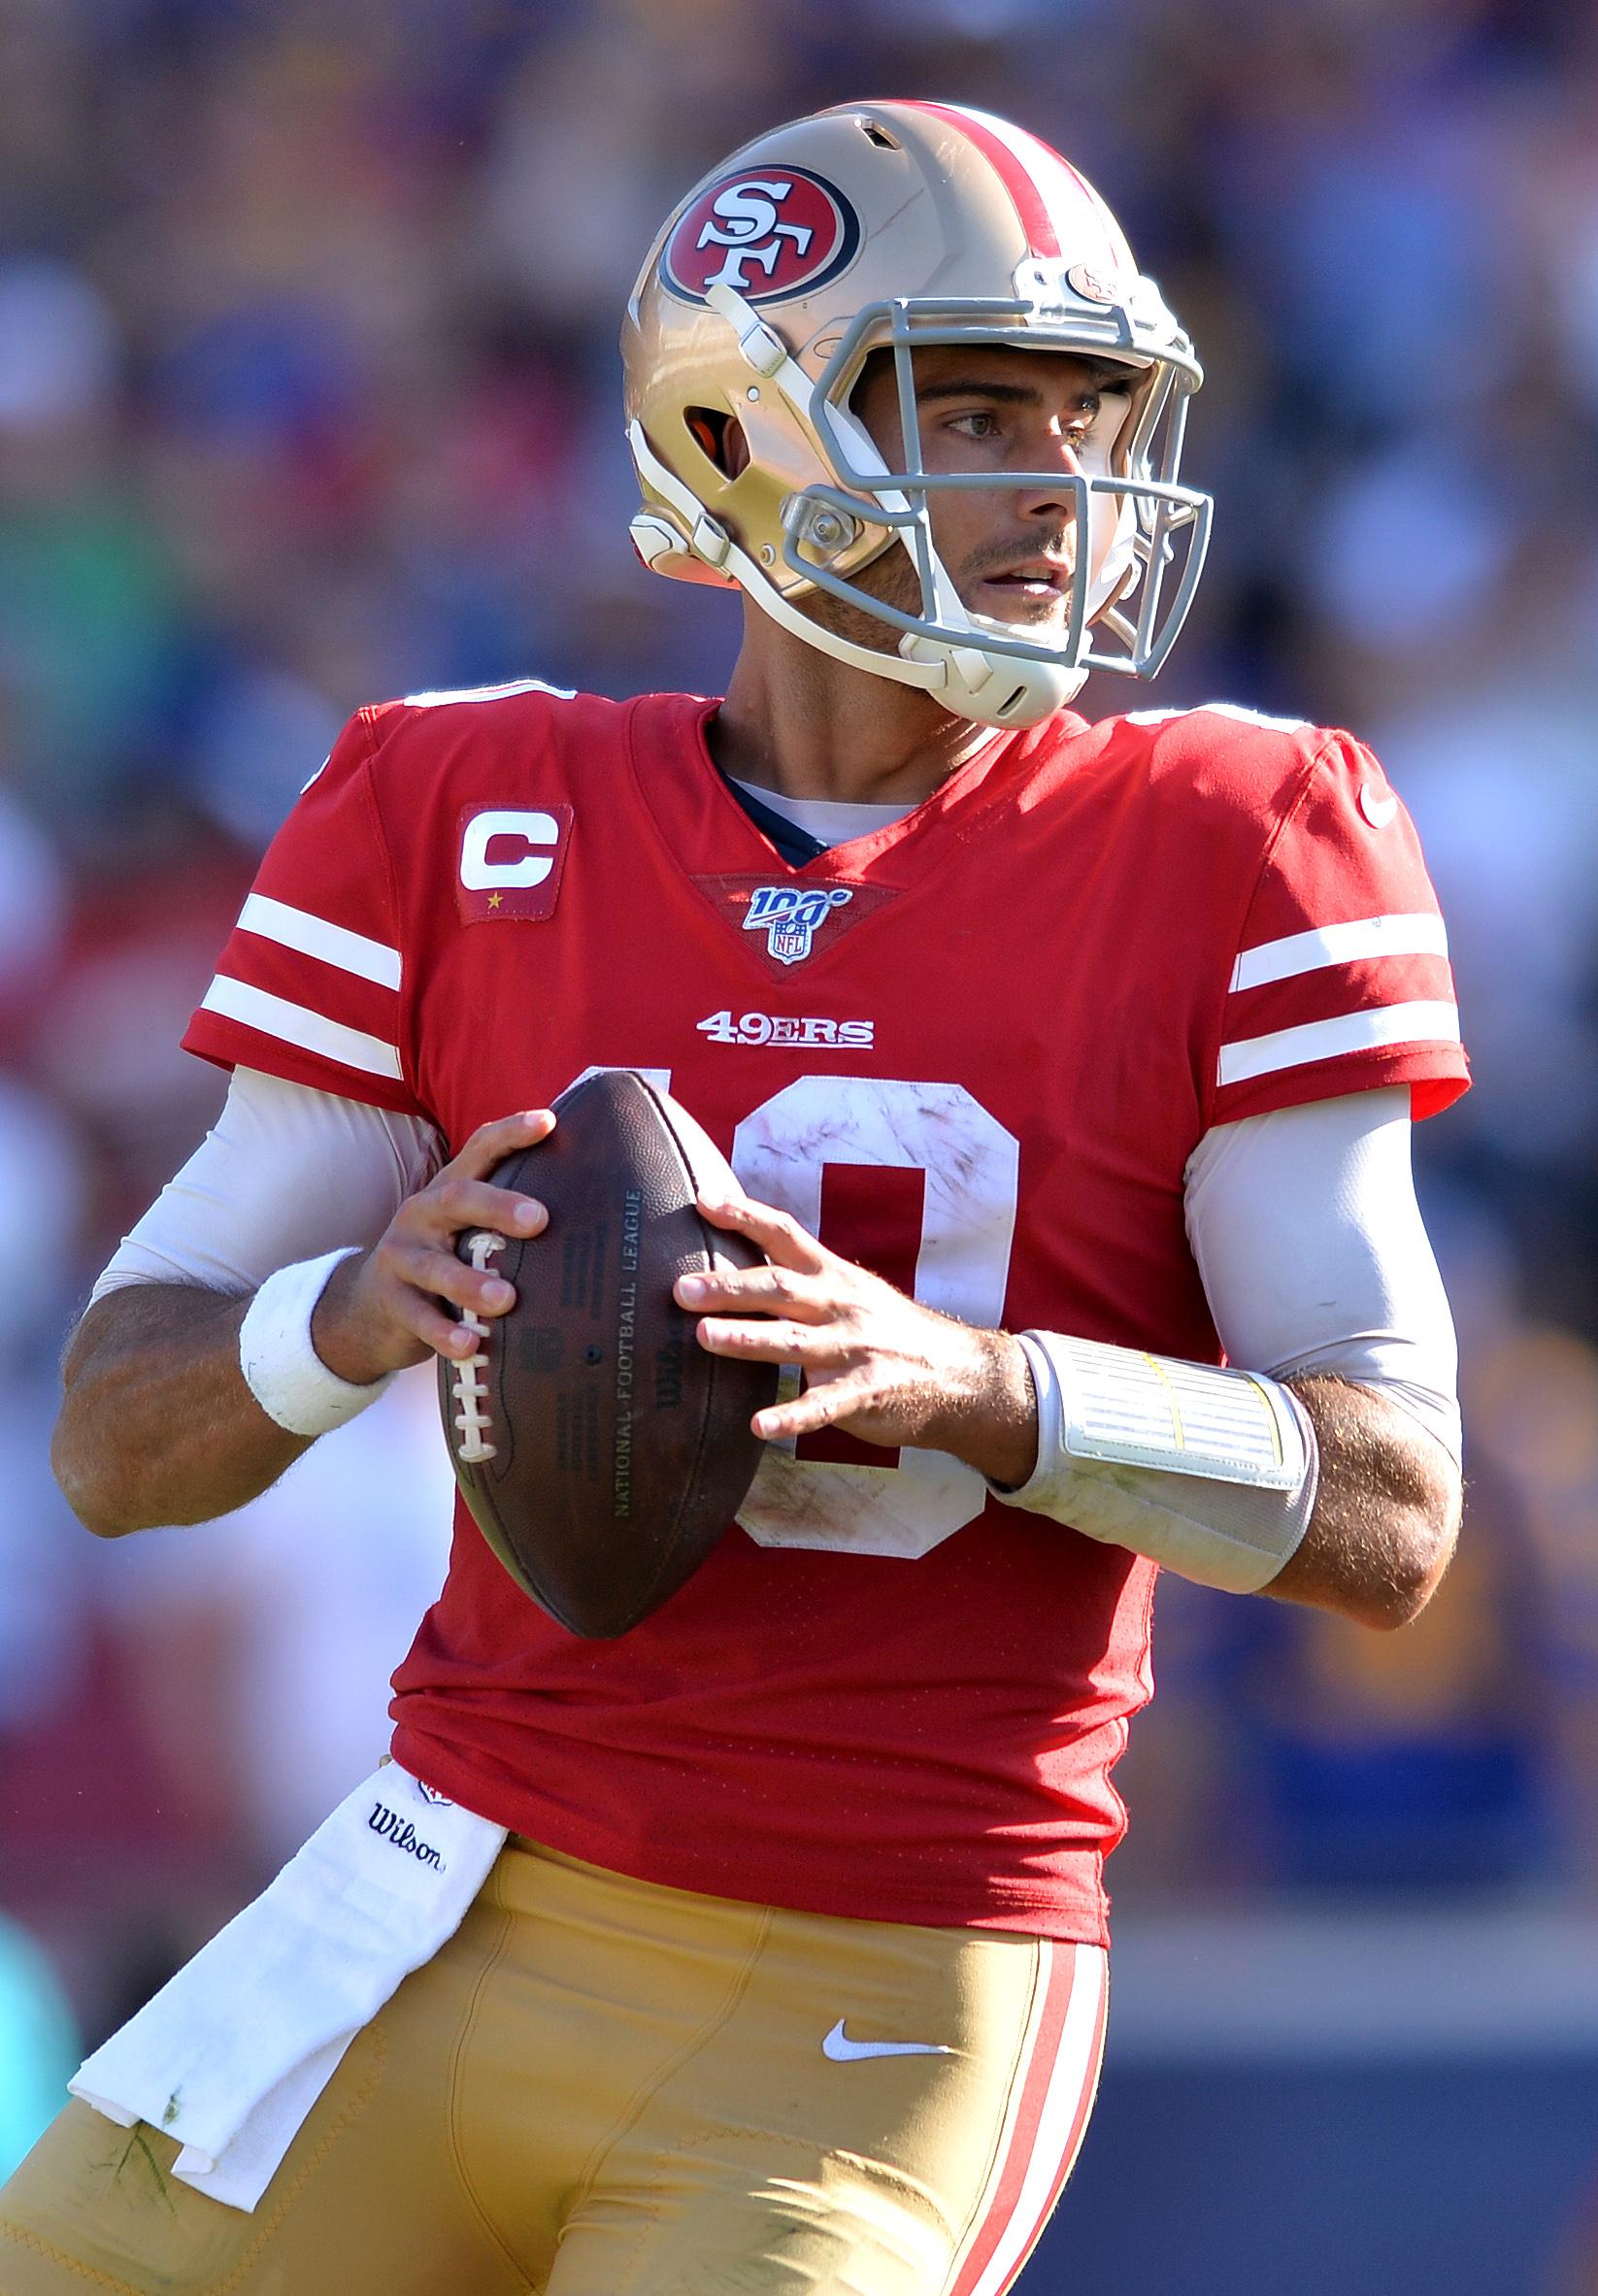 NFL: San Francisco 49ers at Los Angeles Rams